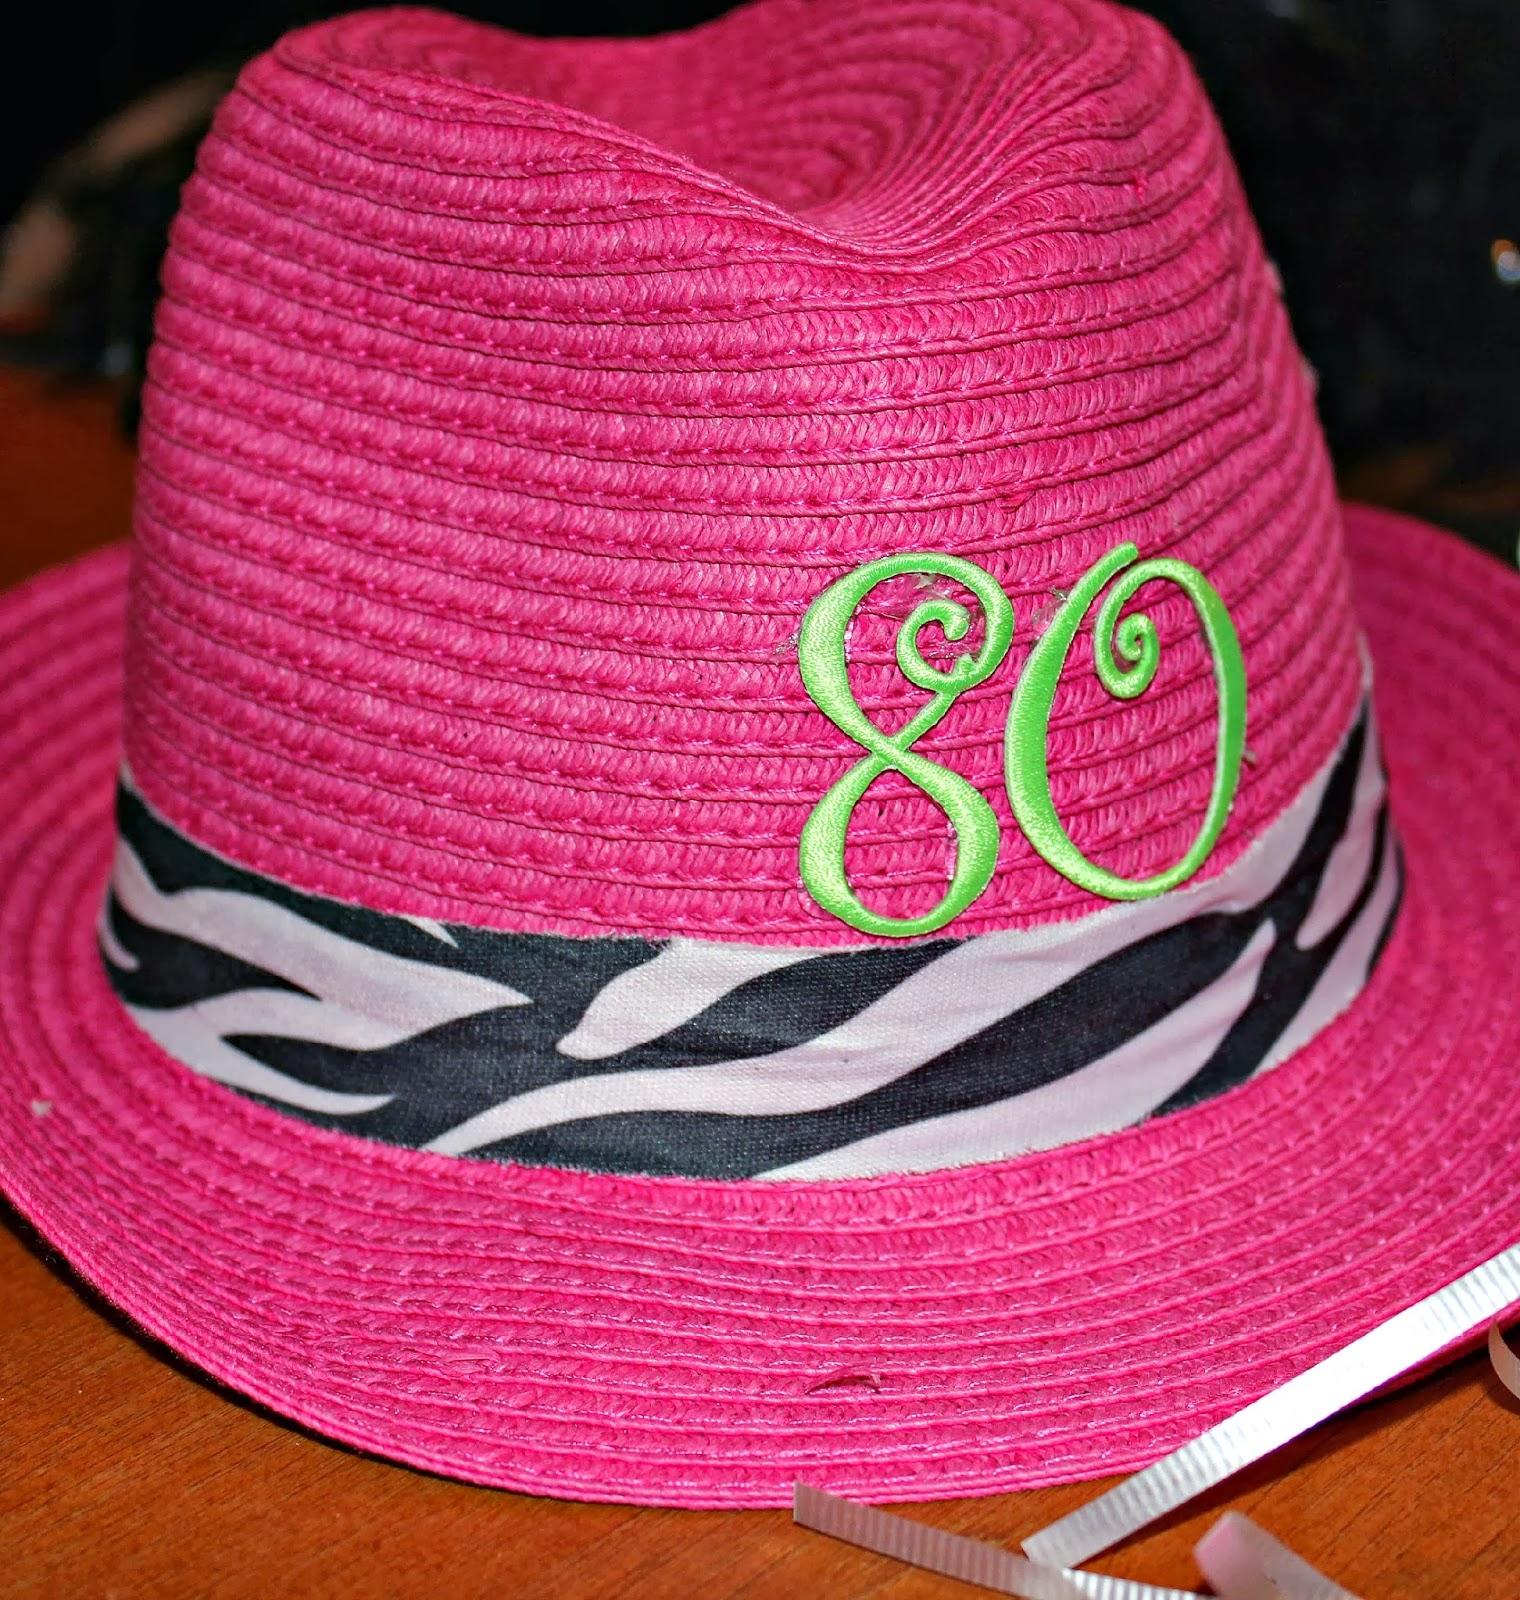 Gran And Aunt Ellen Wore Black Feather Boas 80th Birthday Hats